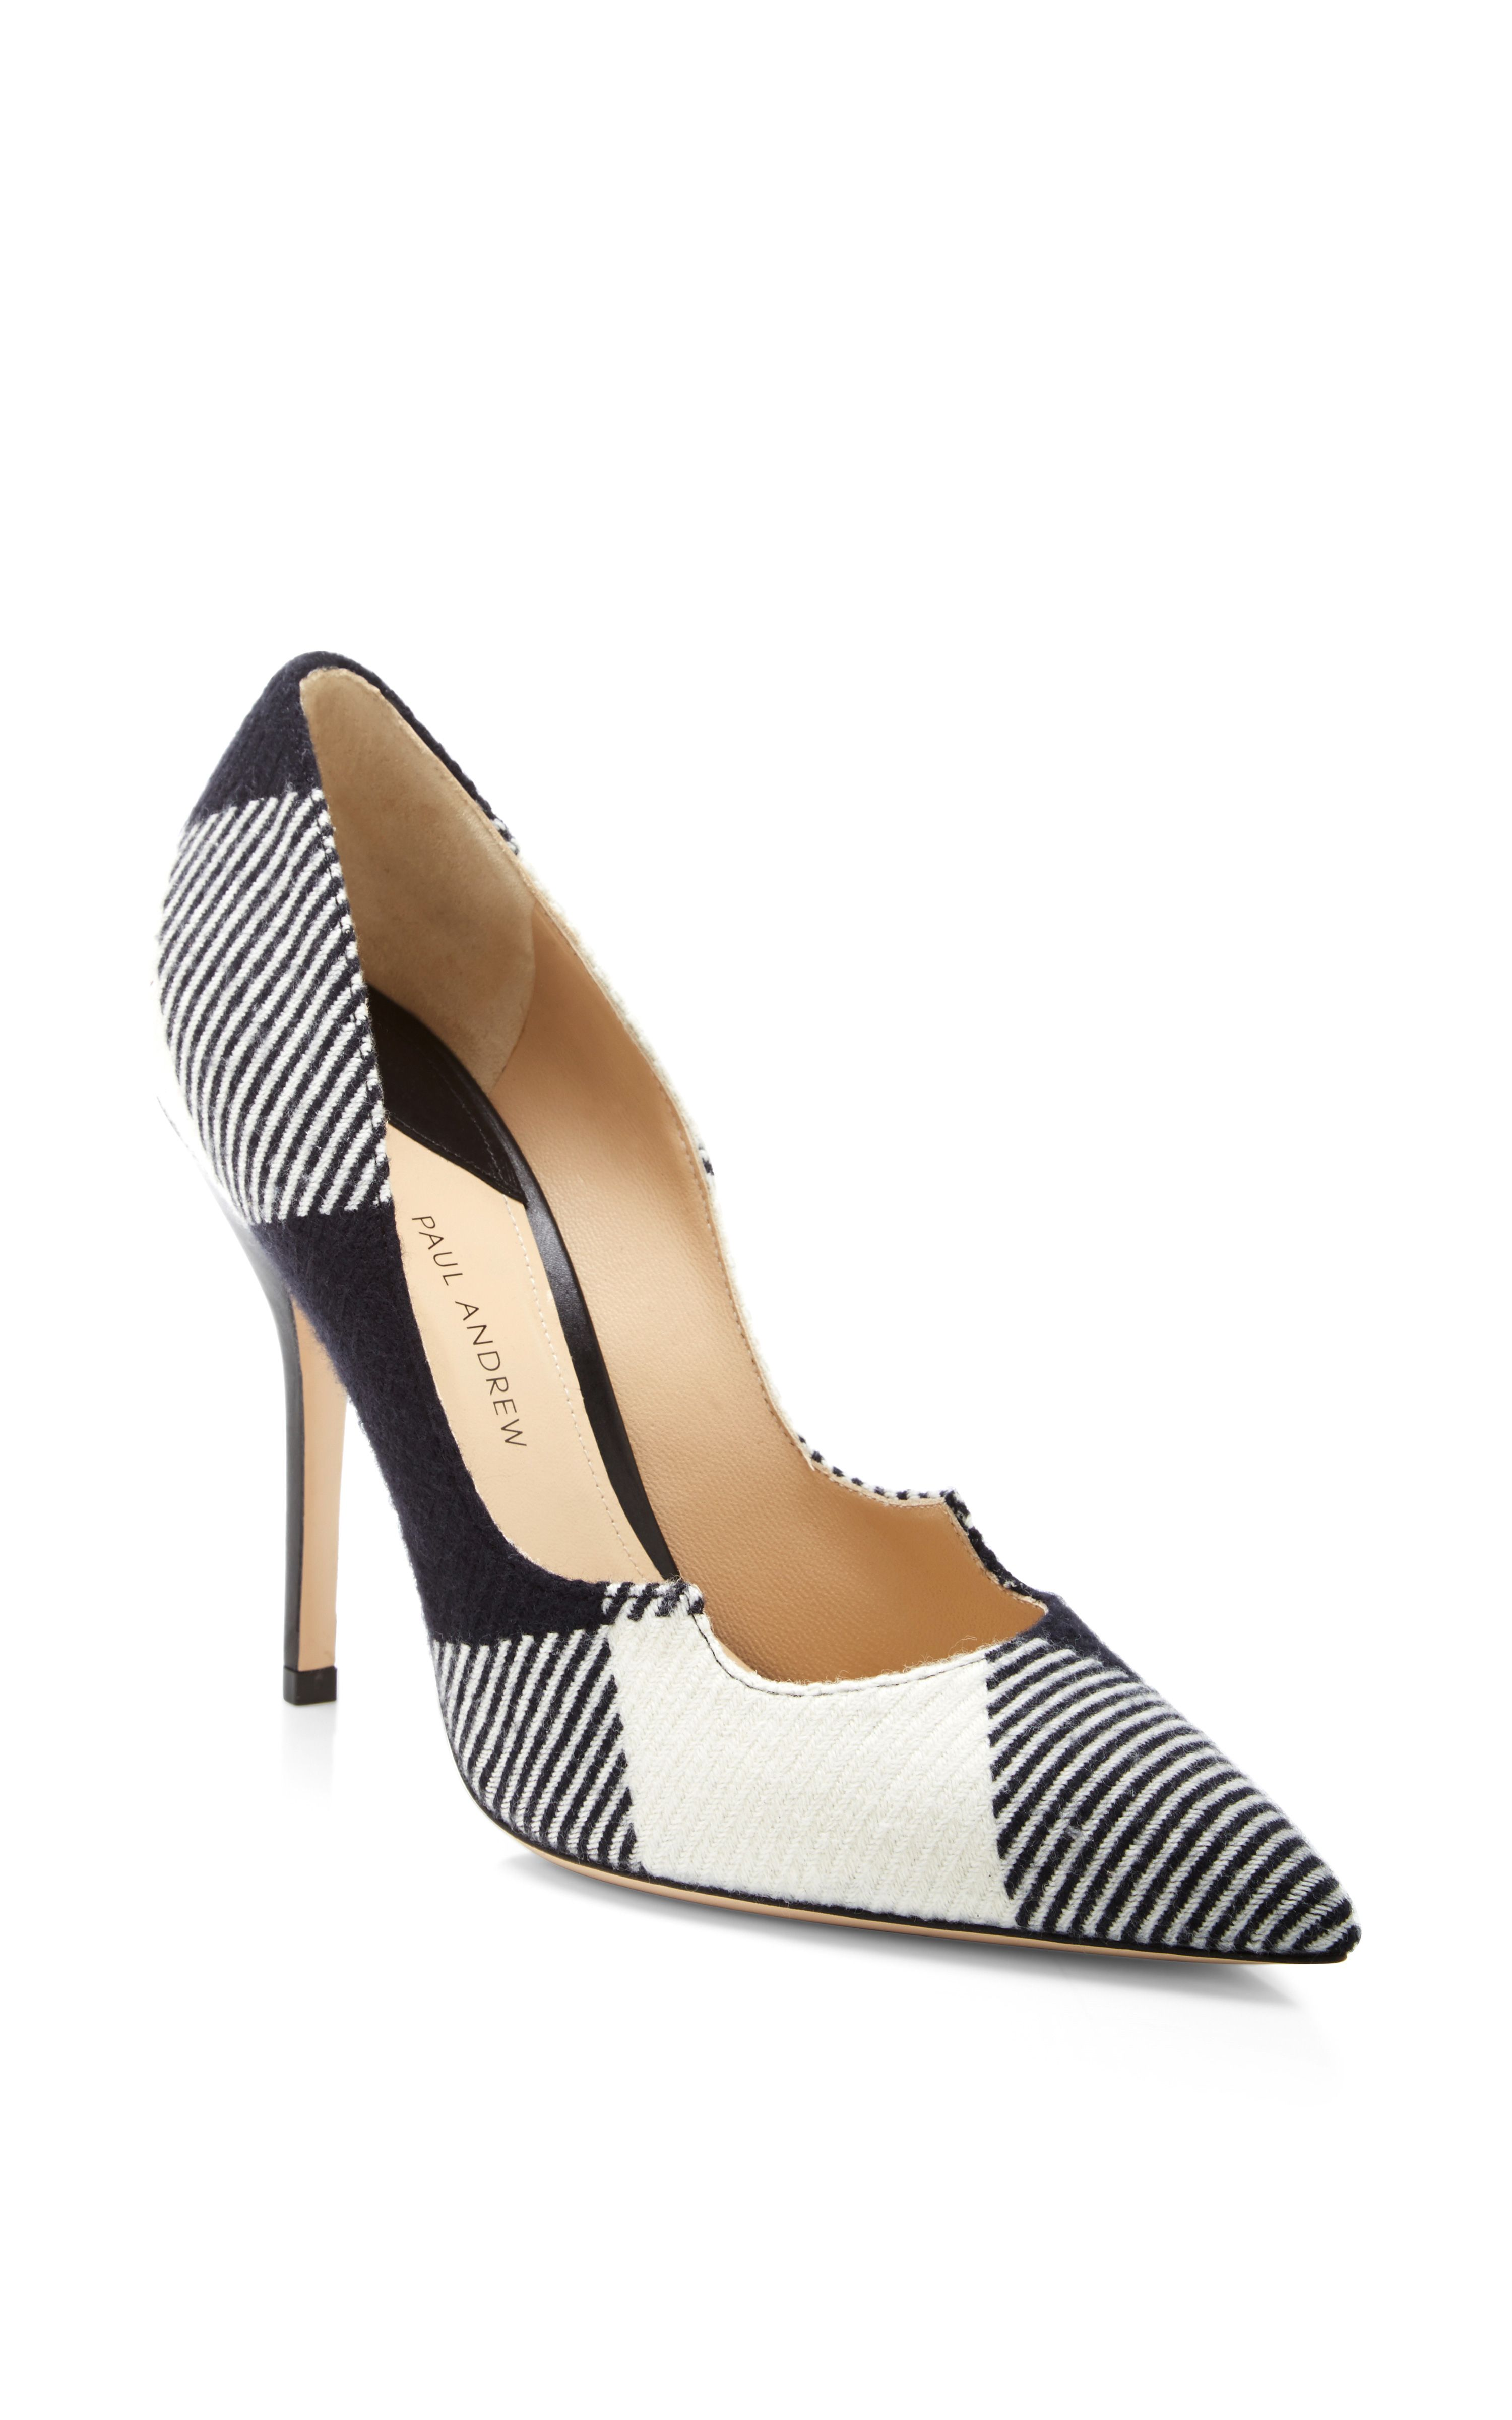 metallic heel pumps - Black PAUL ANDREW Fashionable Cheap Price np1lyyCR5